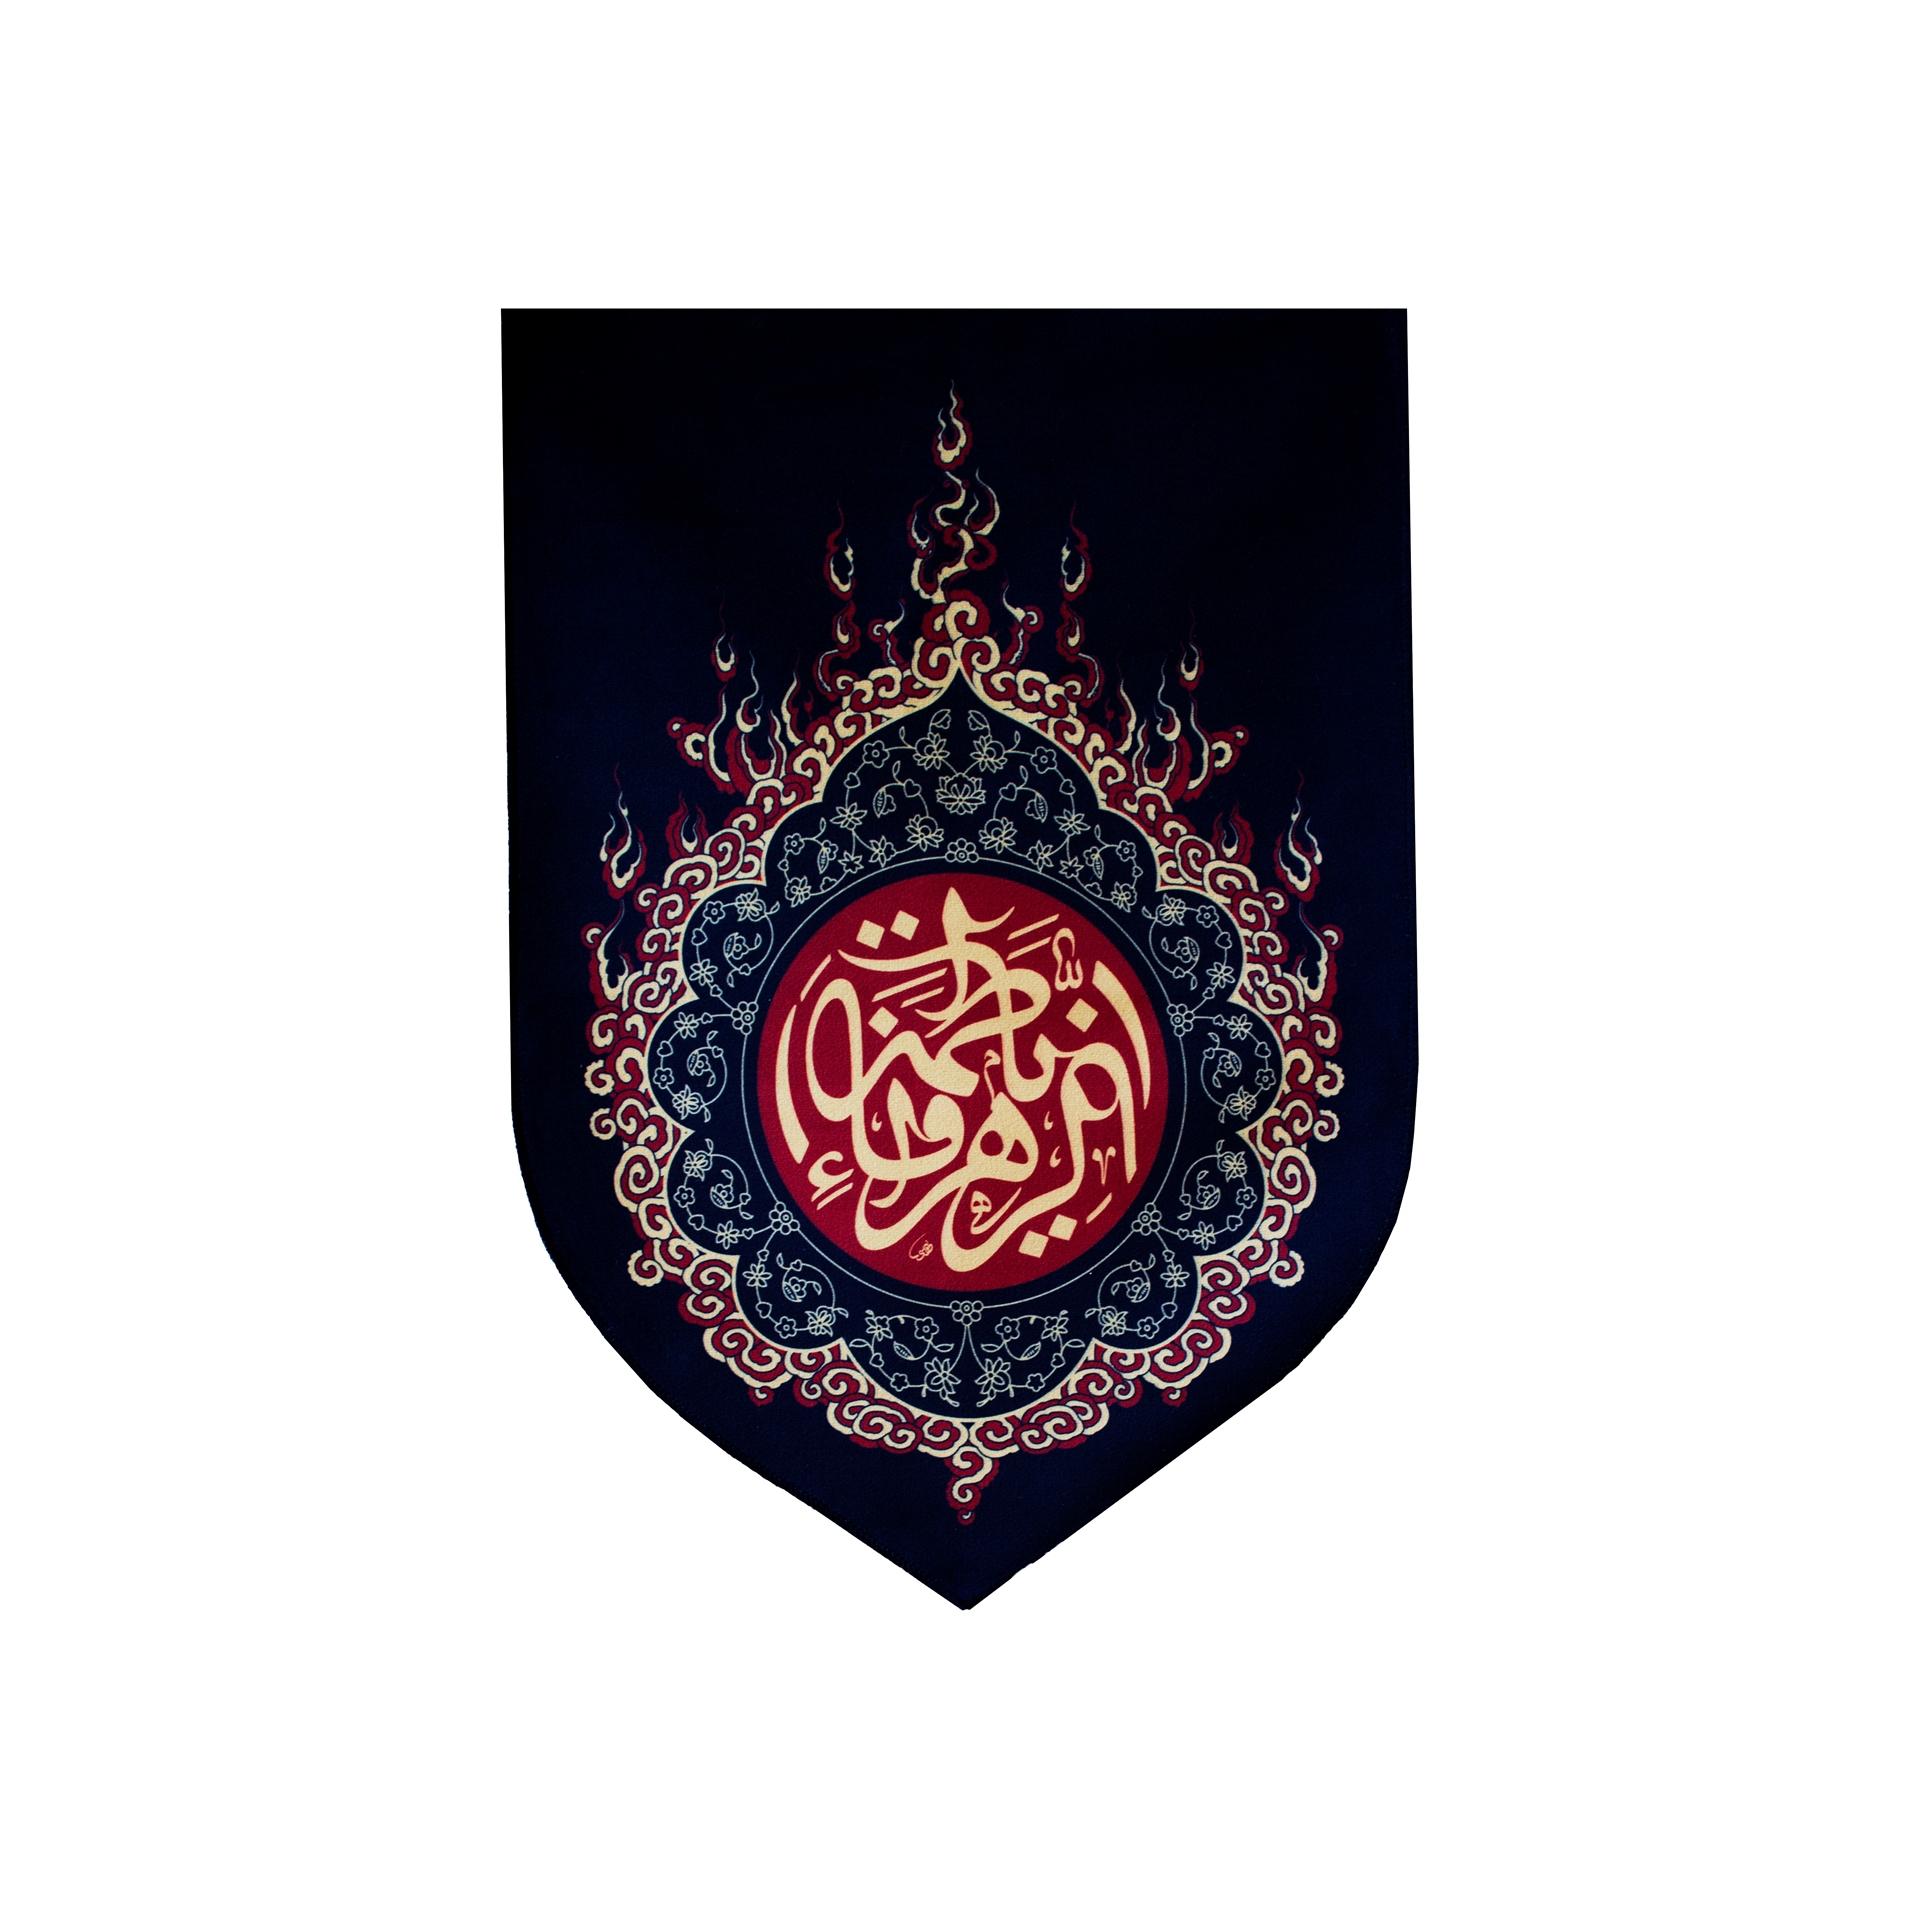 تصویر از بیرق خانگی «یا فاطمة الزهرا» - مشکی